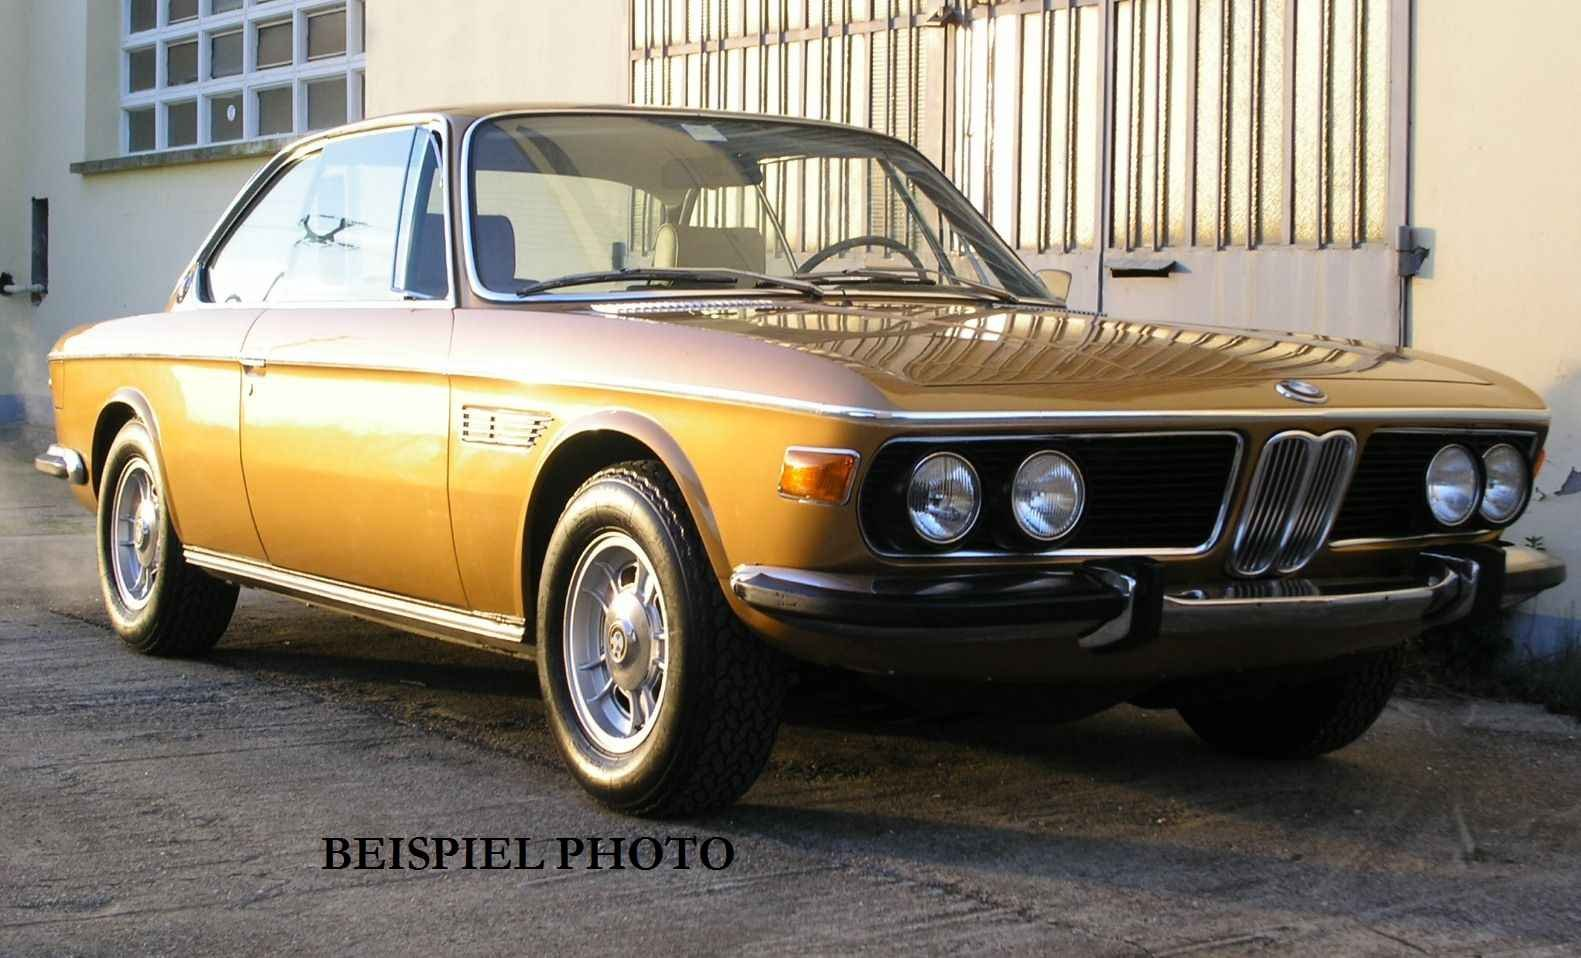 1972 BMW 3.0 CSI Ceylon metallic  For Sale (picture 1 of 1)